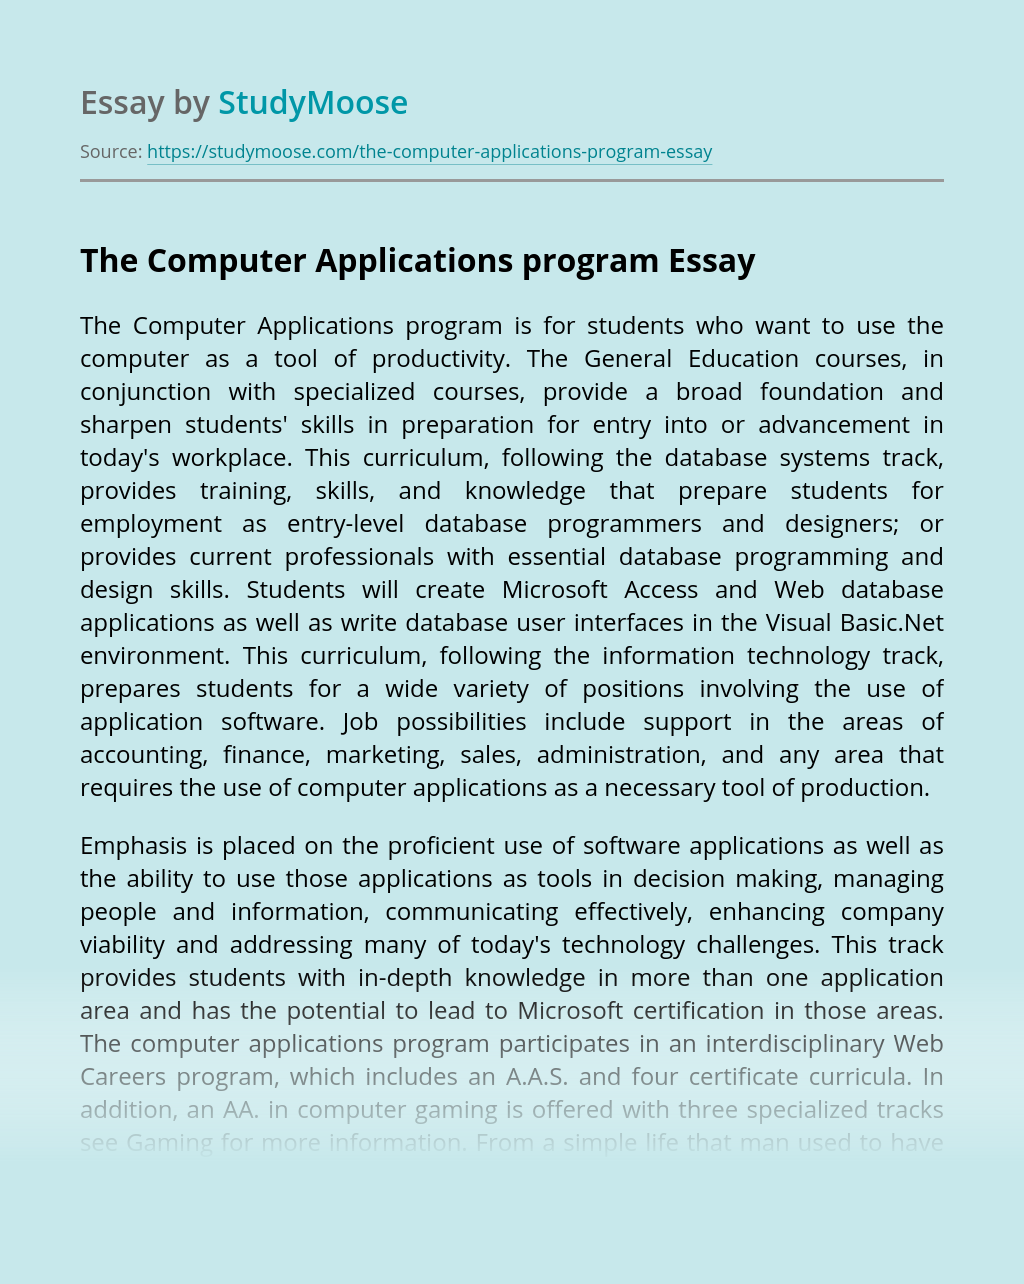 The Computer Applications program